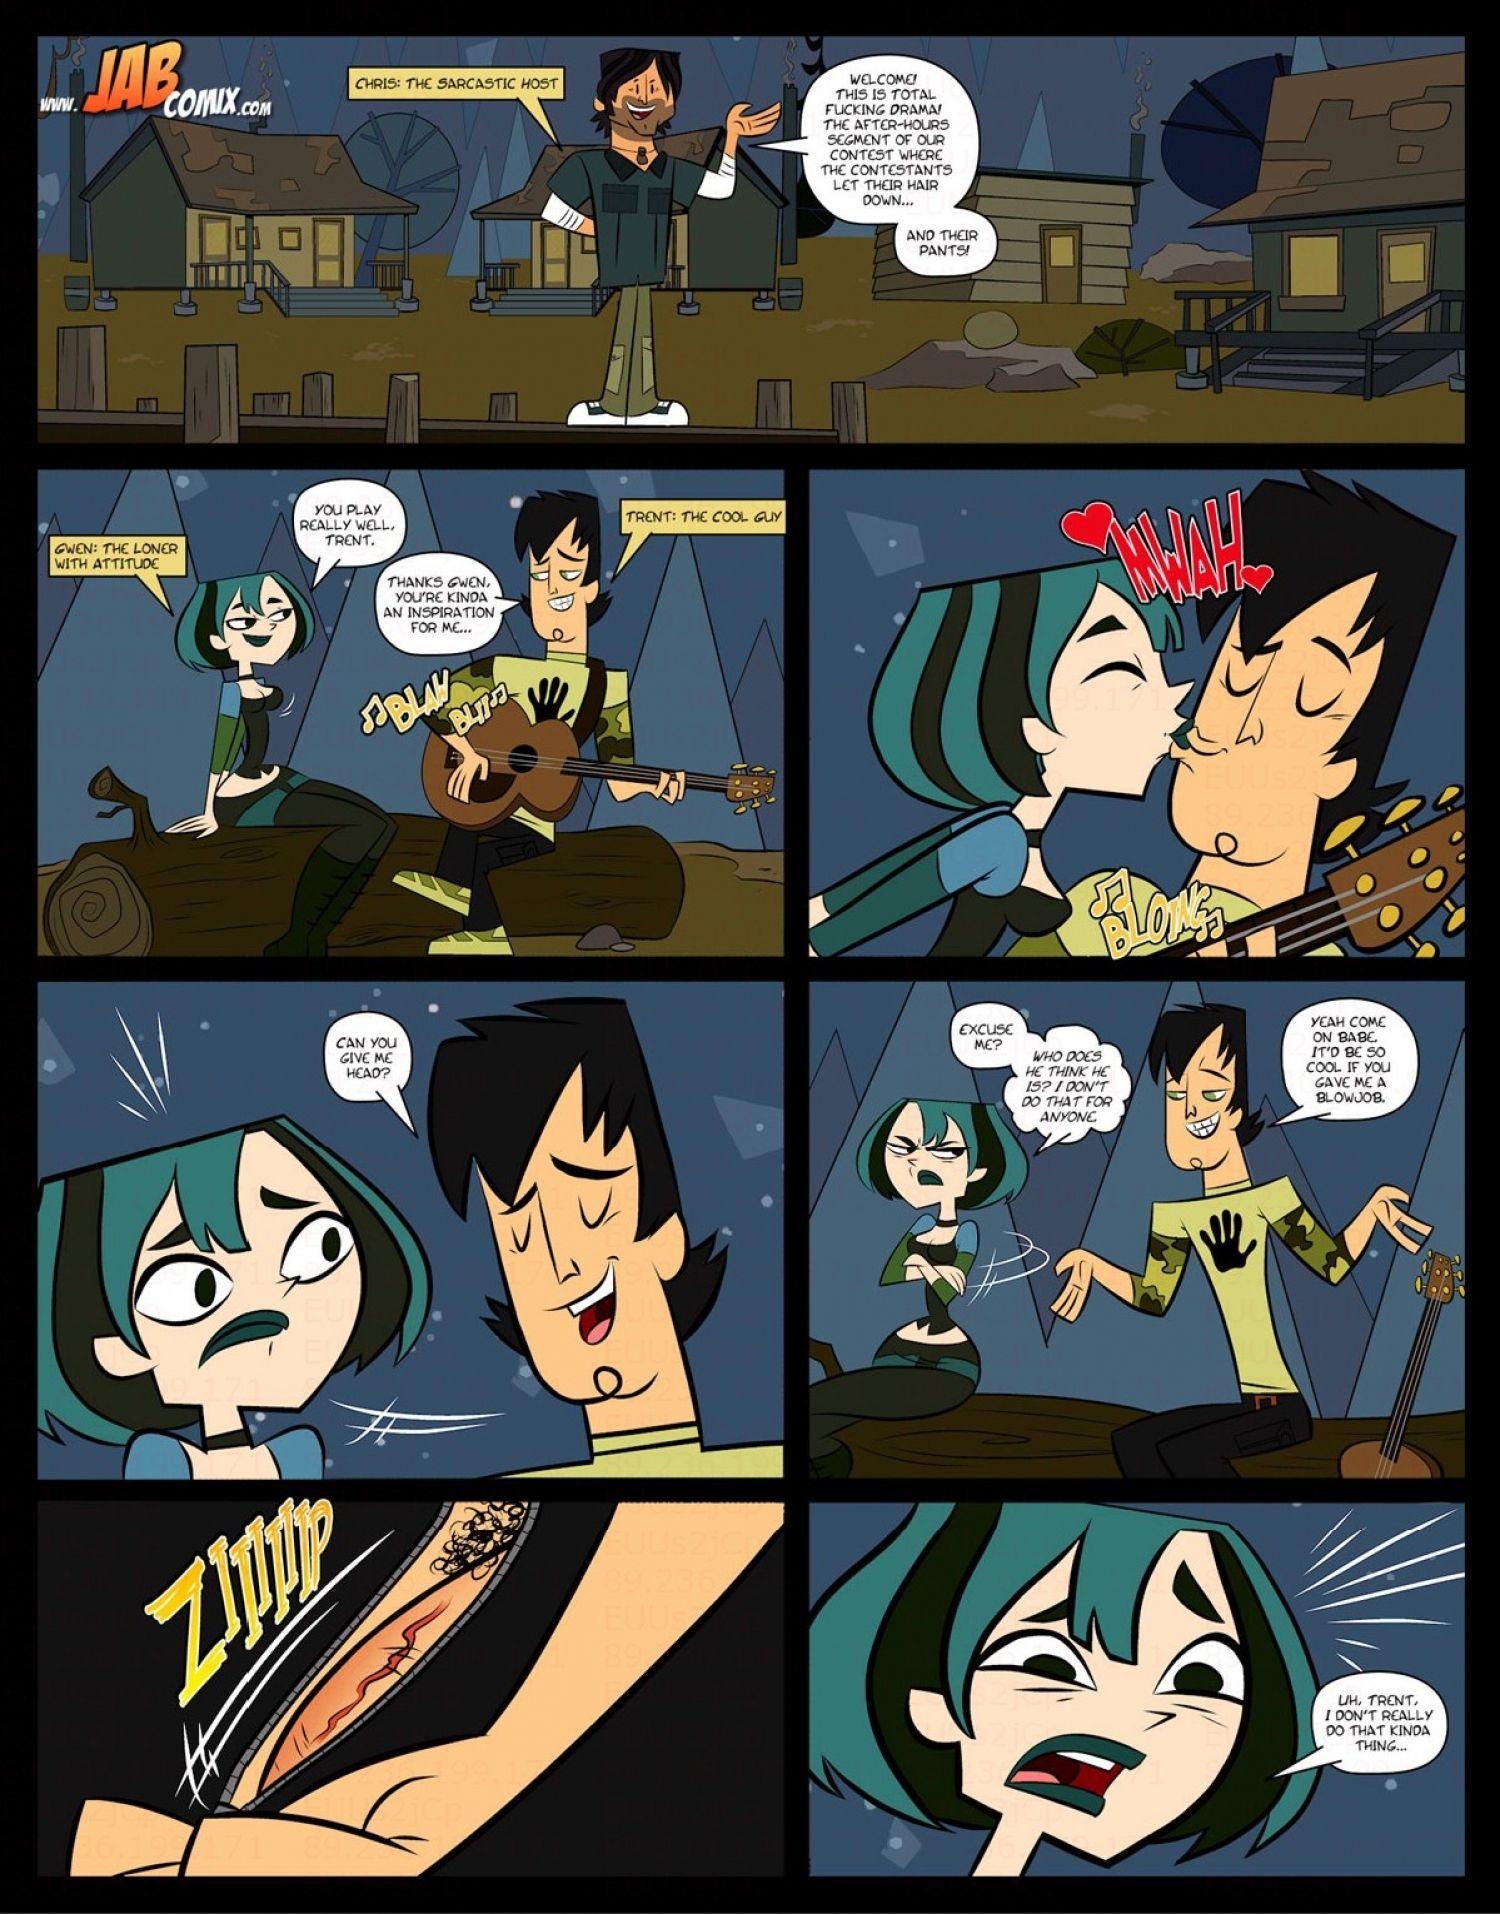 Jab comix total fucking drama litosh comics